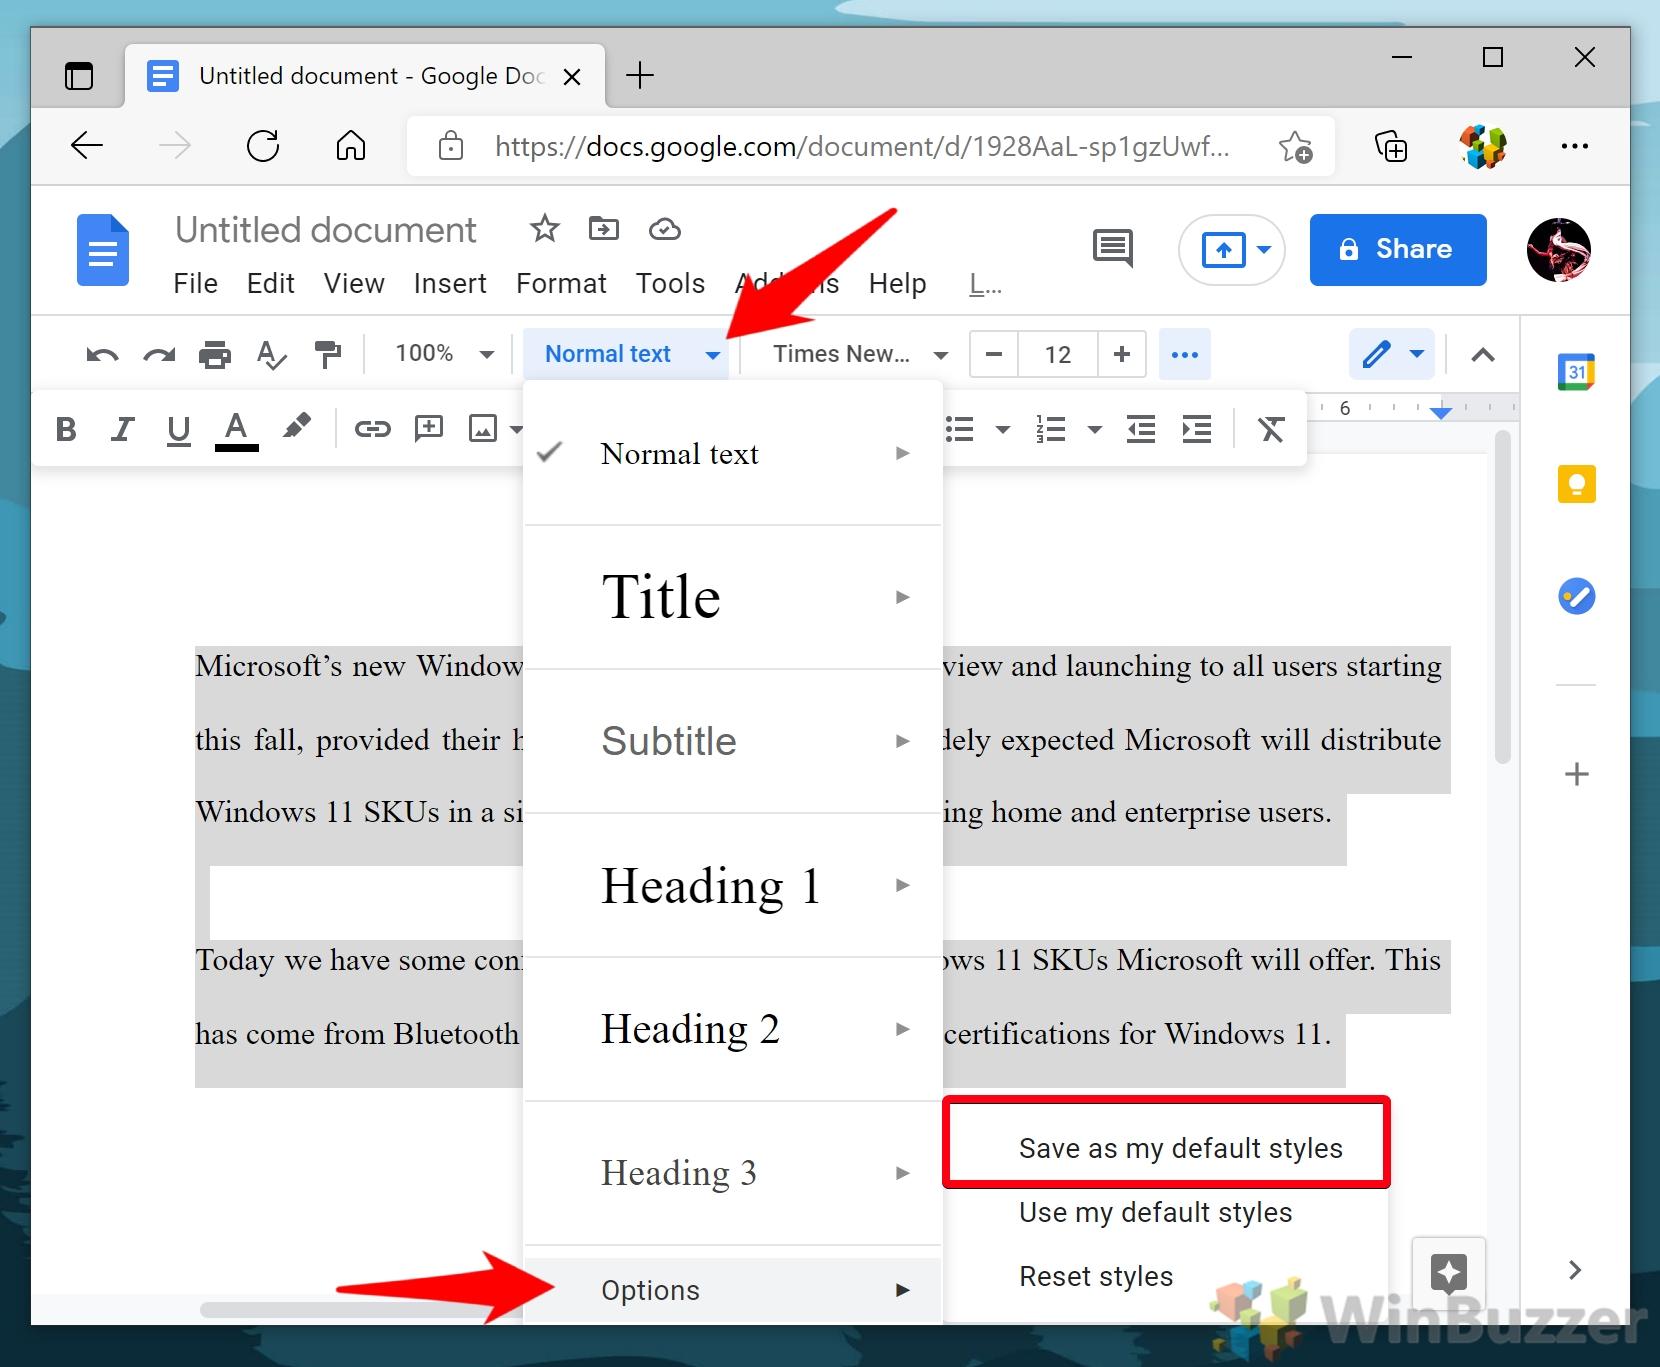 Windows 10 - Google Docs - Highlight Text - Normal Text - Options - Save Default Styles